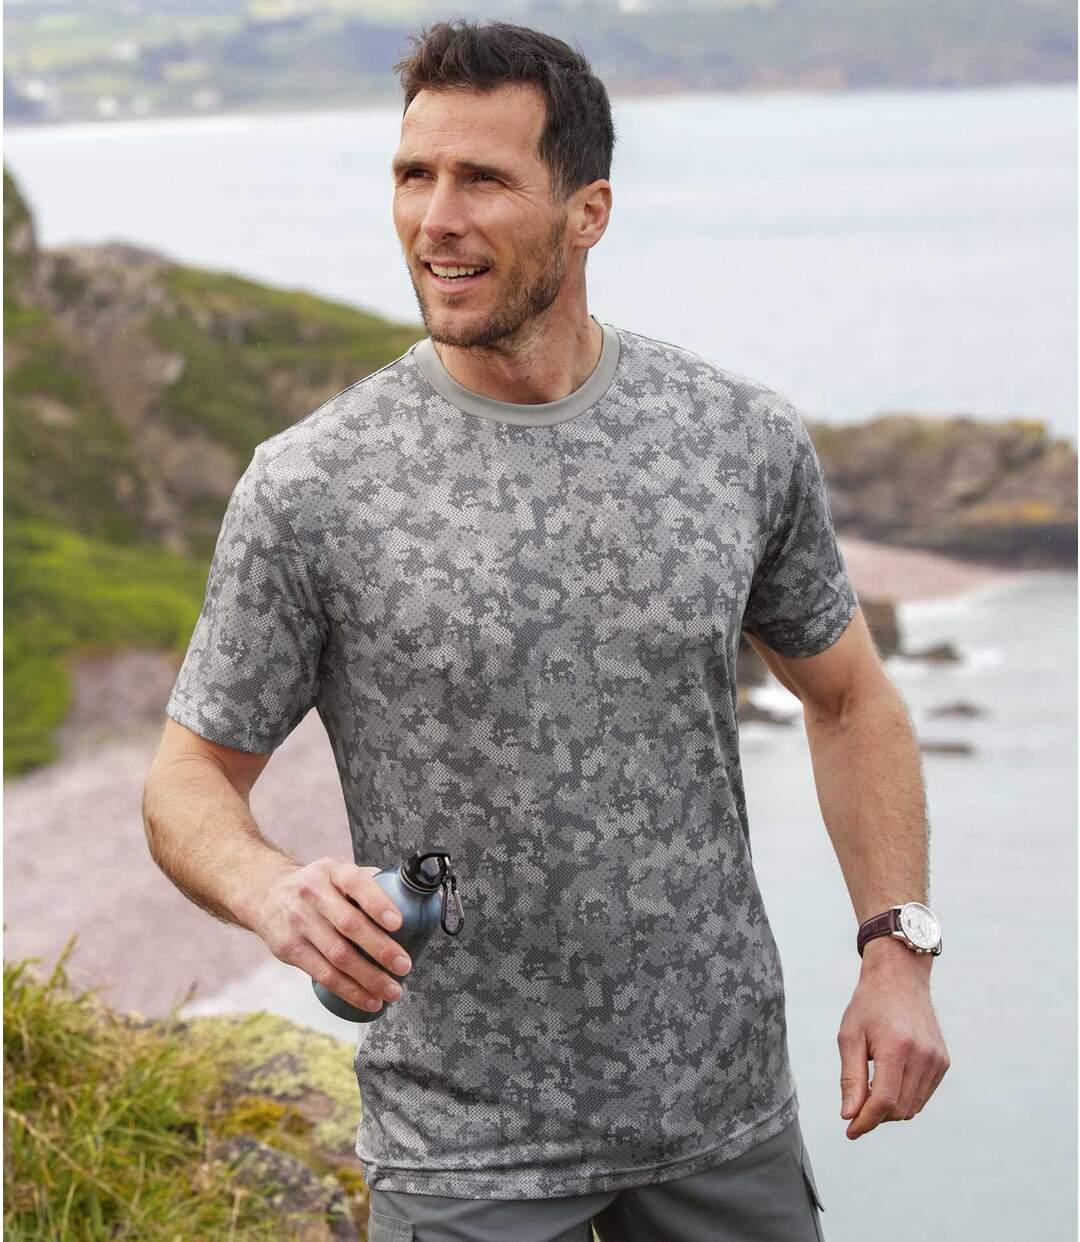 Pack of 2 Men's Camouflage T-Shirts - Blue Grey  Atlas For Men